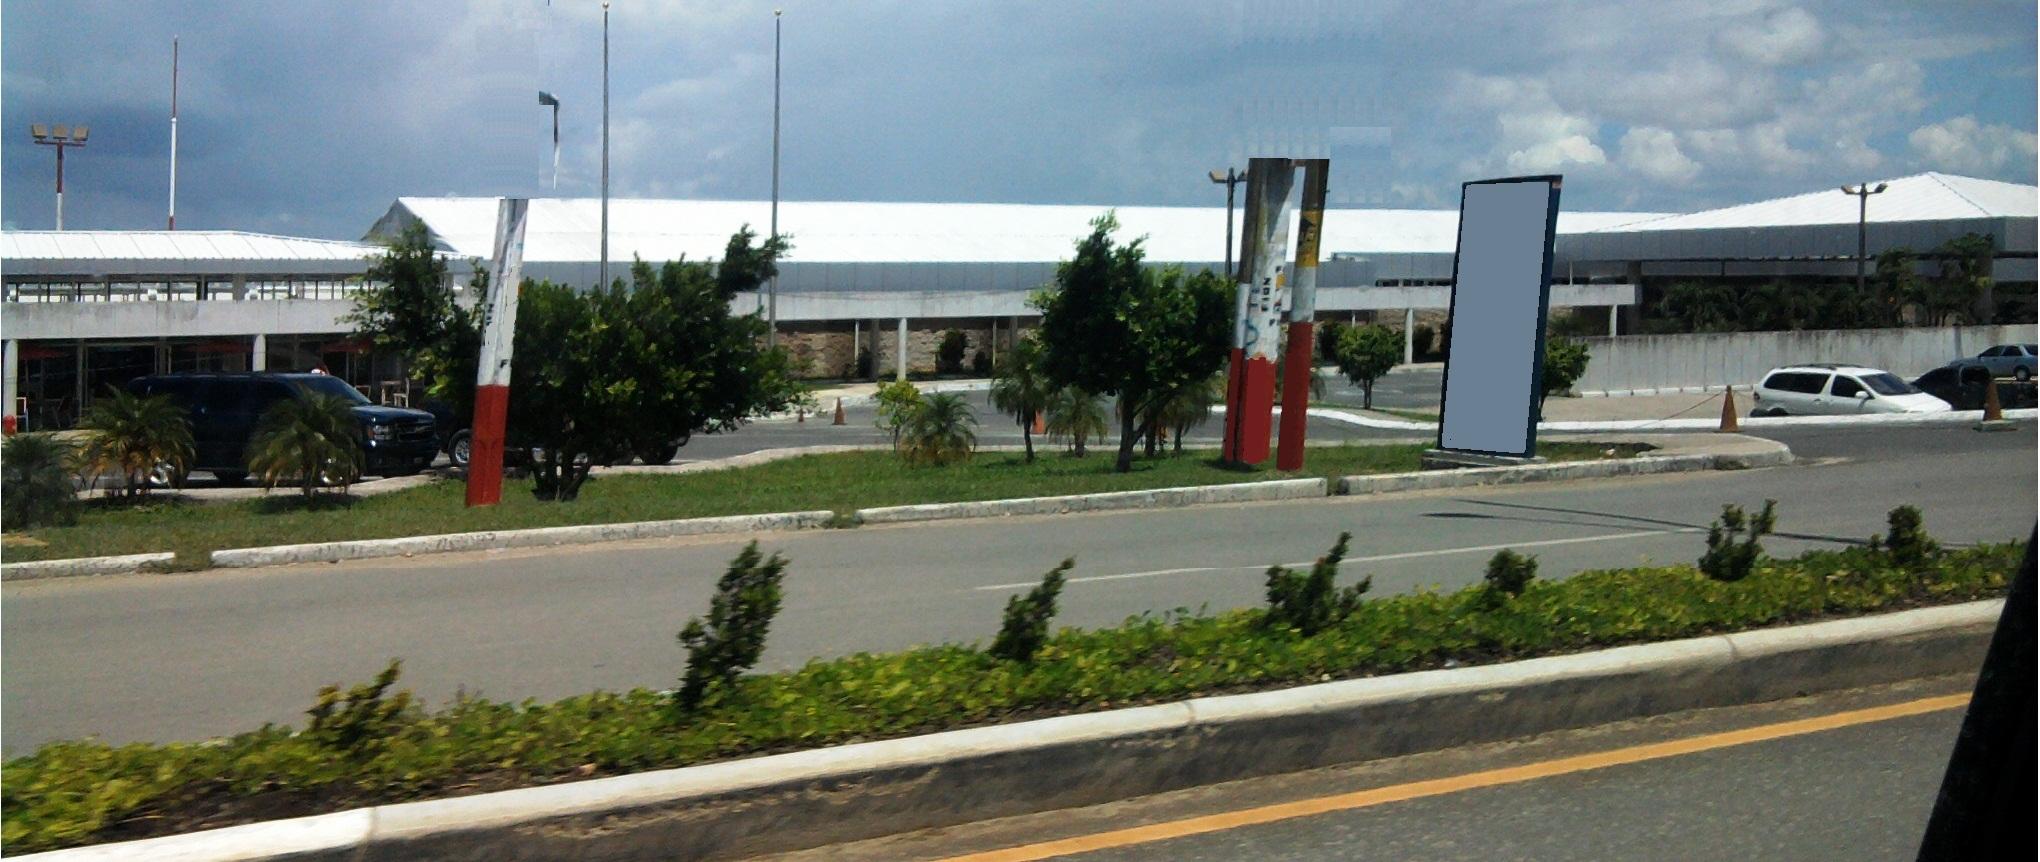 Aeropuerto Internacional Guatemala File:aeropuerto Internacional